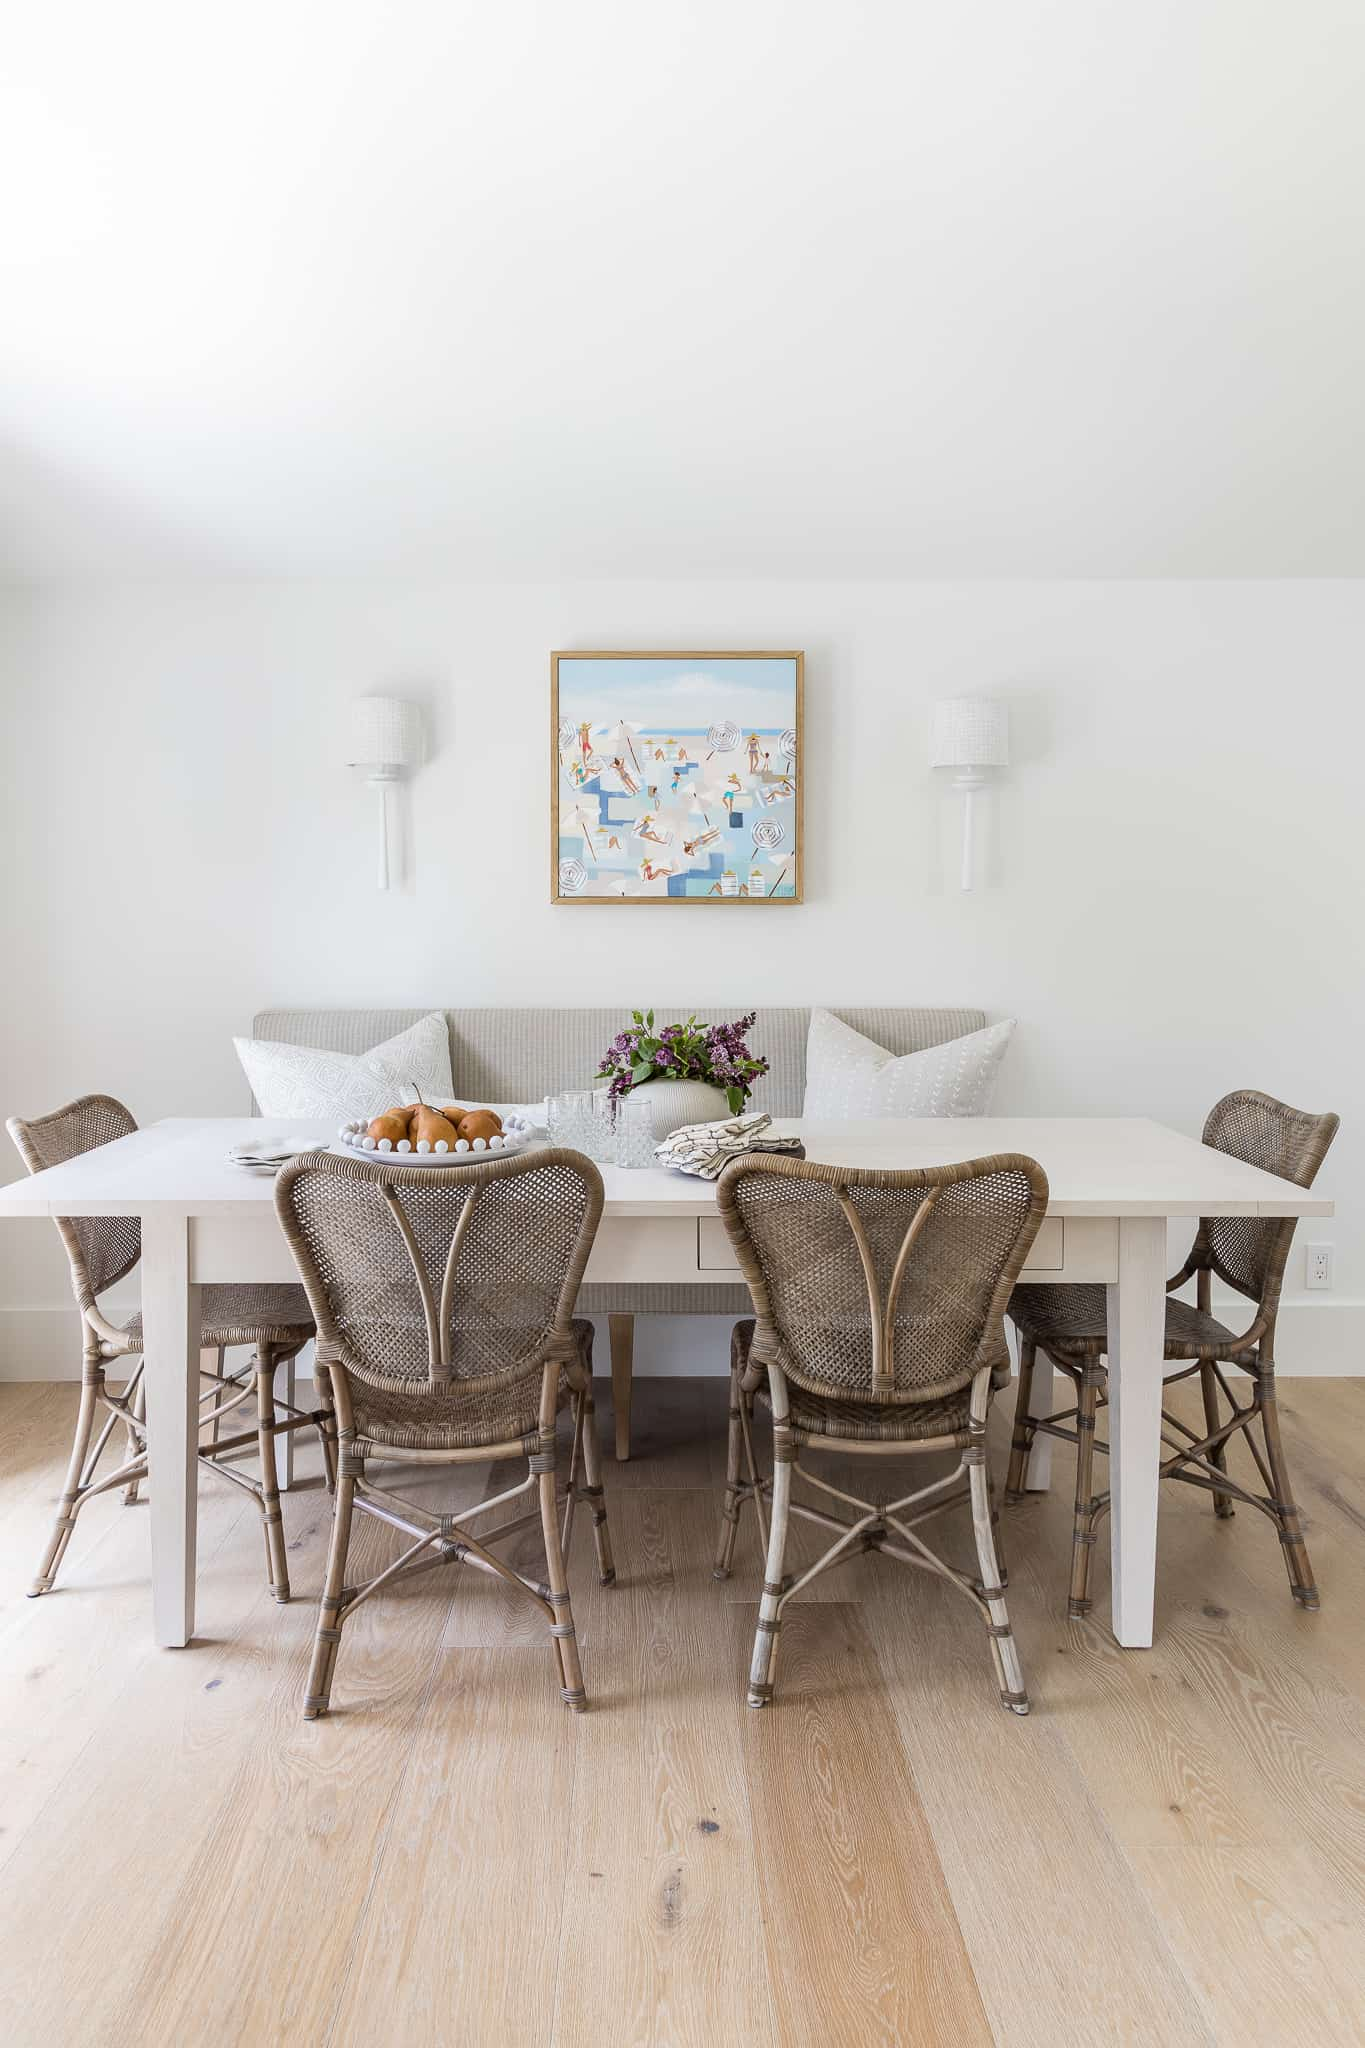 Port Newport Project - Mindy Gayer Design Co. - Coastal Family Kitchen Nook